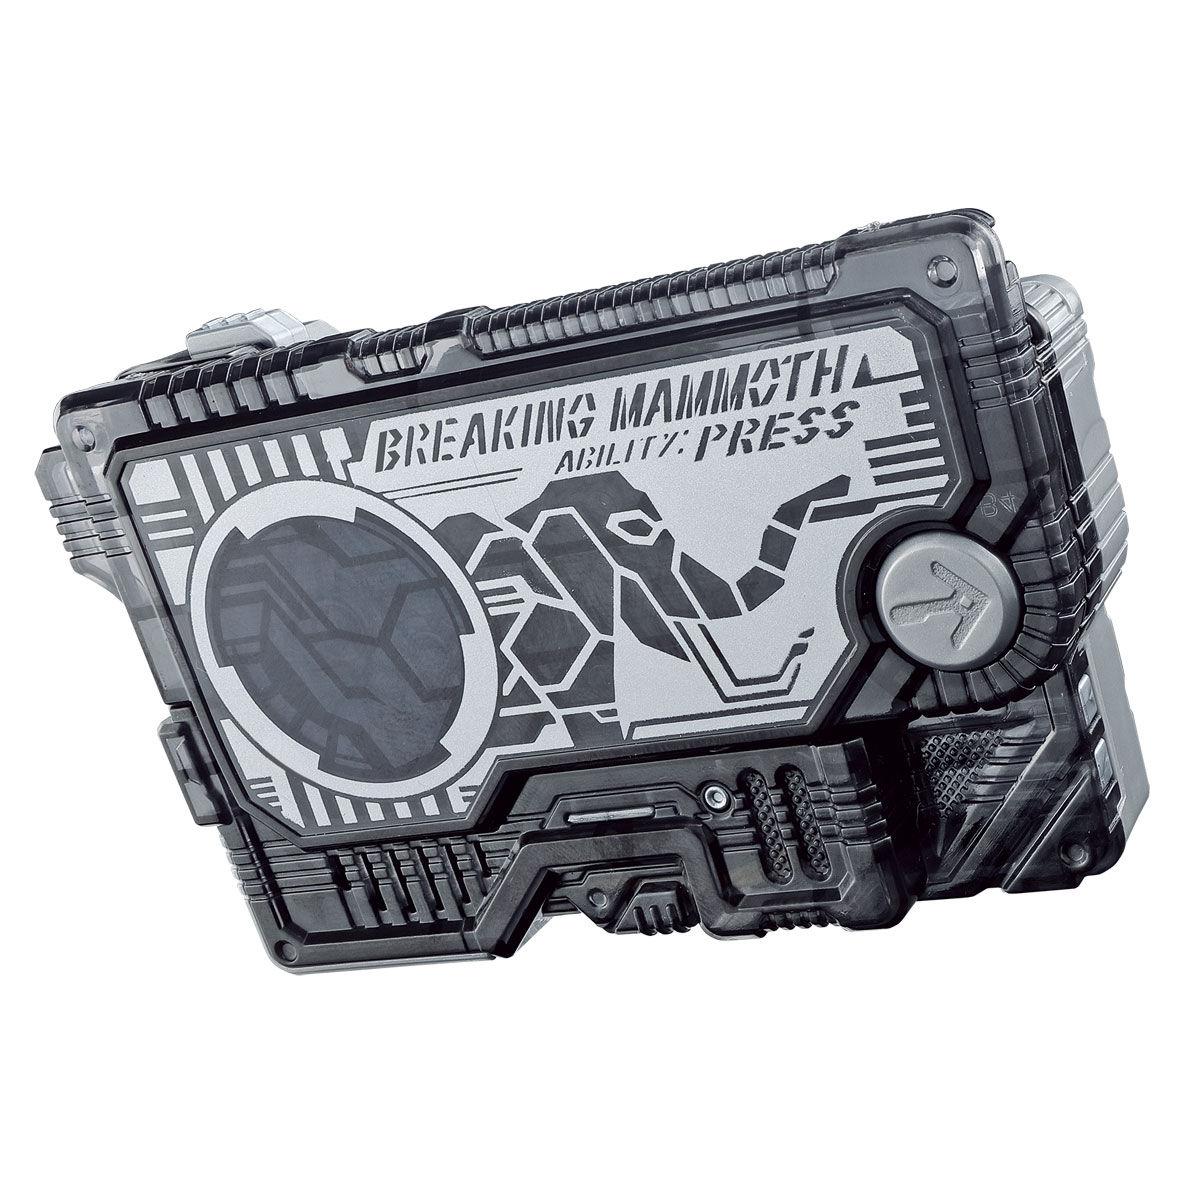 DXブレイキングマンモス&ブレイキングマンモスプログライズキー